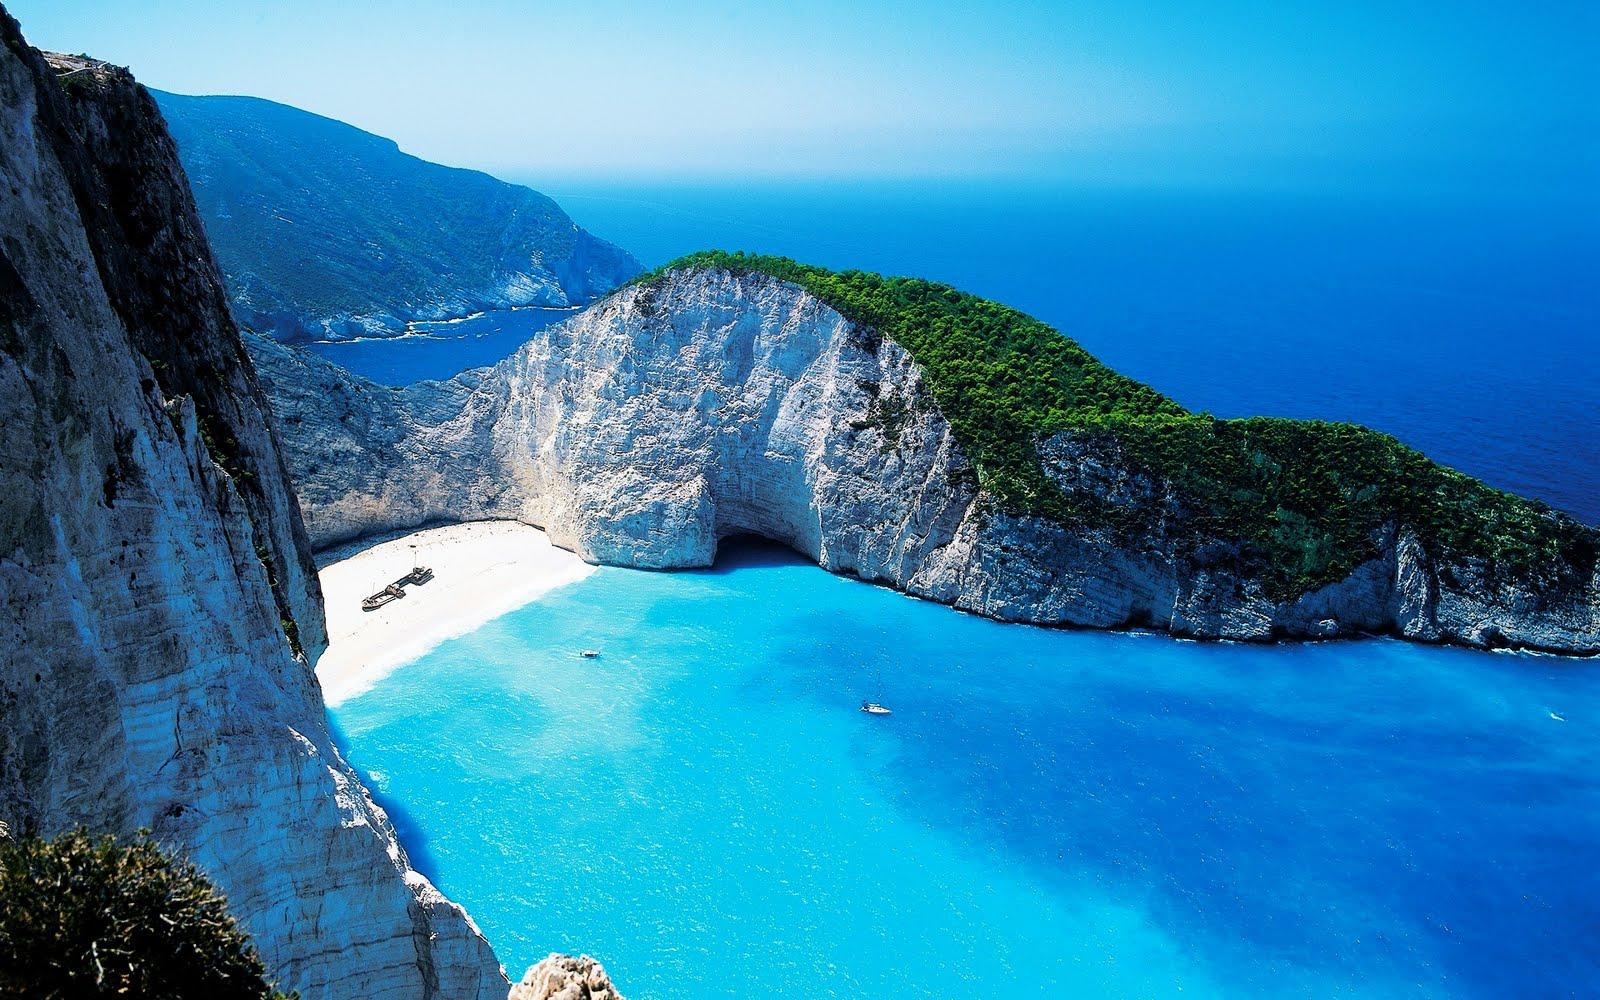 Fotos e Imagenes: Calita de arena blanca y agua azul turquesa